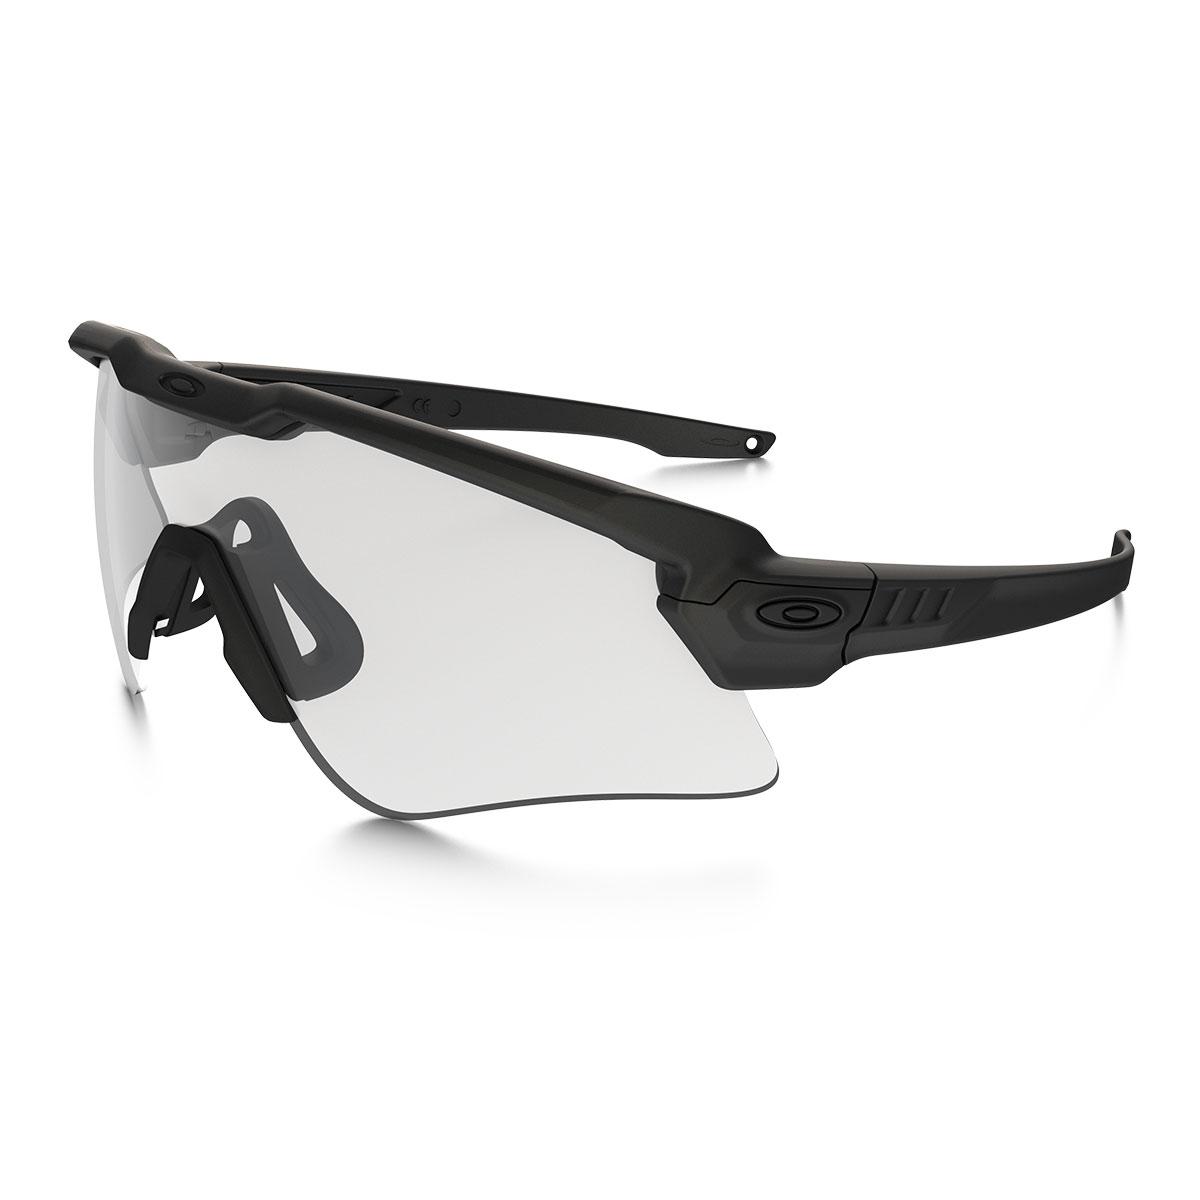 6c21d5e742 Oakley - SI Ballistic M Frame Alpha Array - Matte Black Frame w  Grey